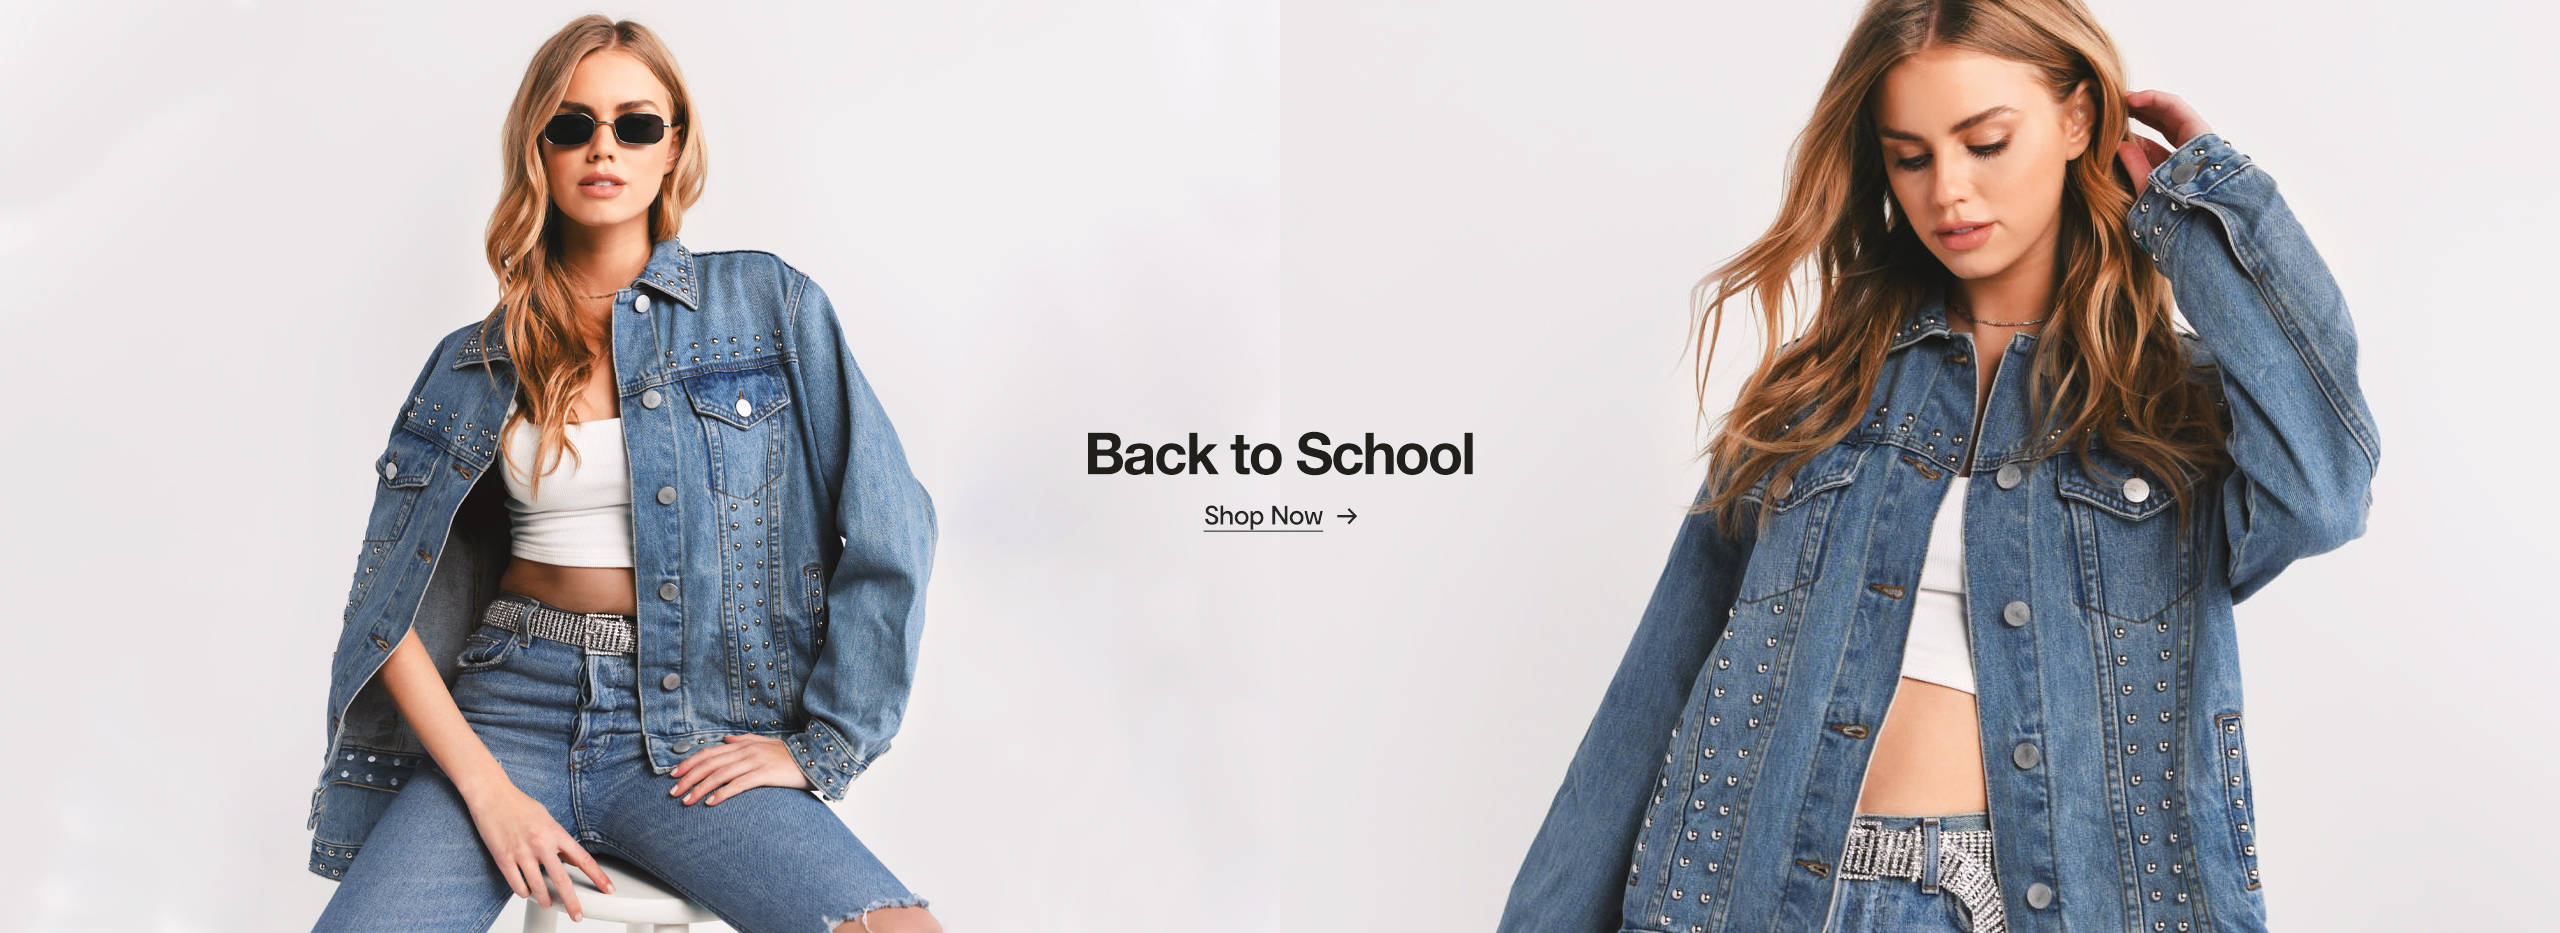 a784d1b20 Tobi - Online Shopping Website for Women, Online Women's Clothing ...